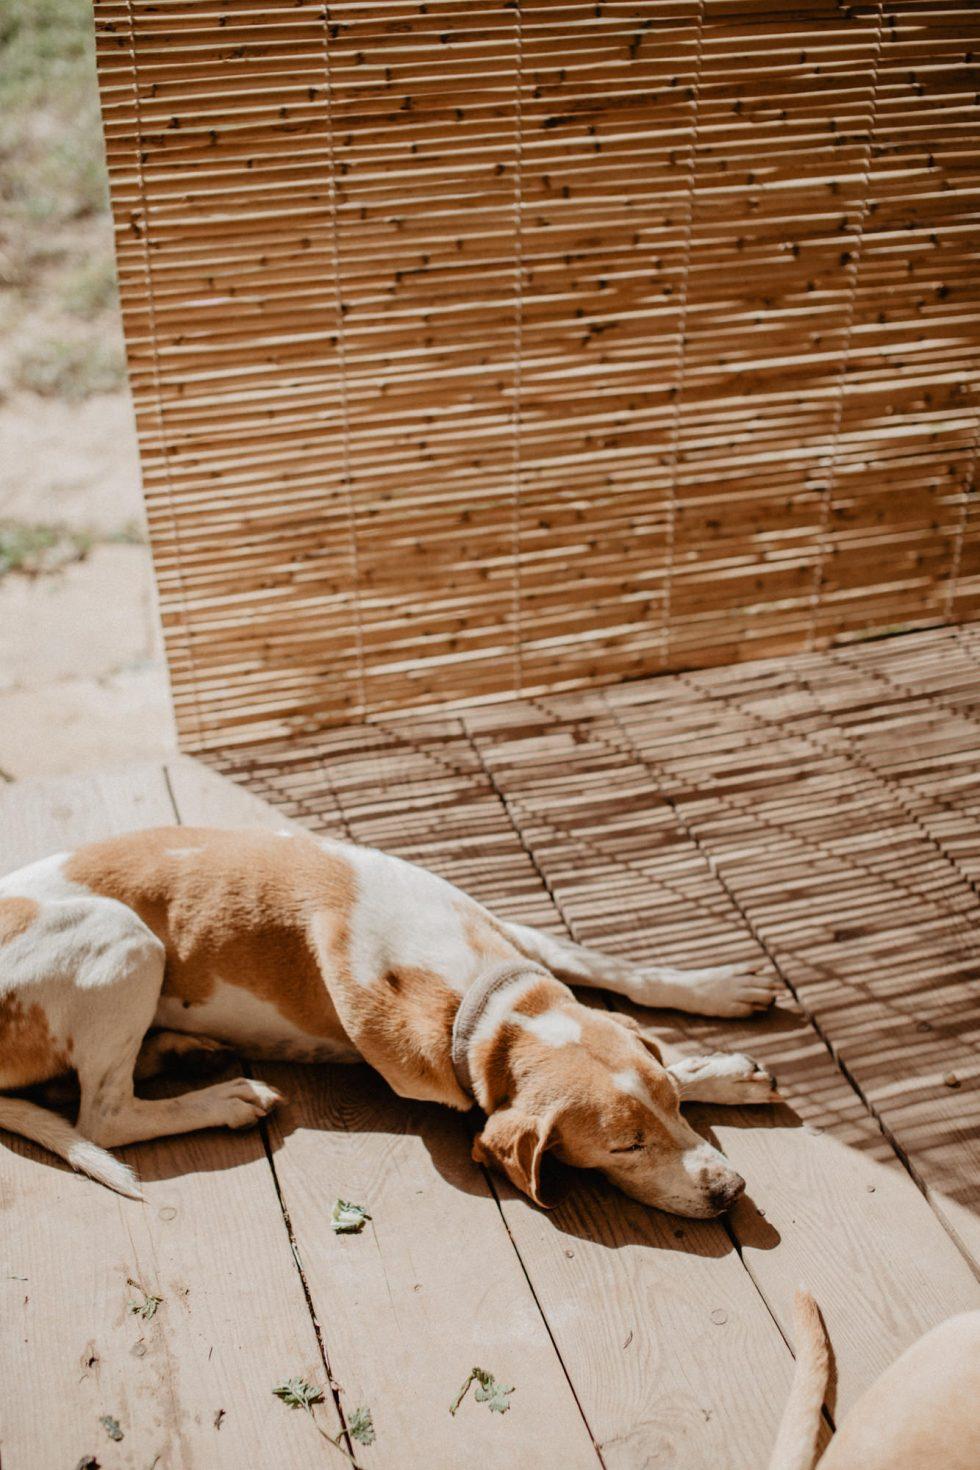 malta-travel-sustainable-farm-lifestyle-photographer-laura-g-diaz-6